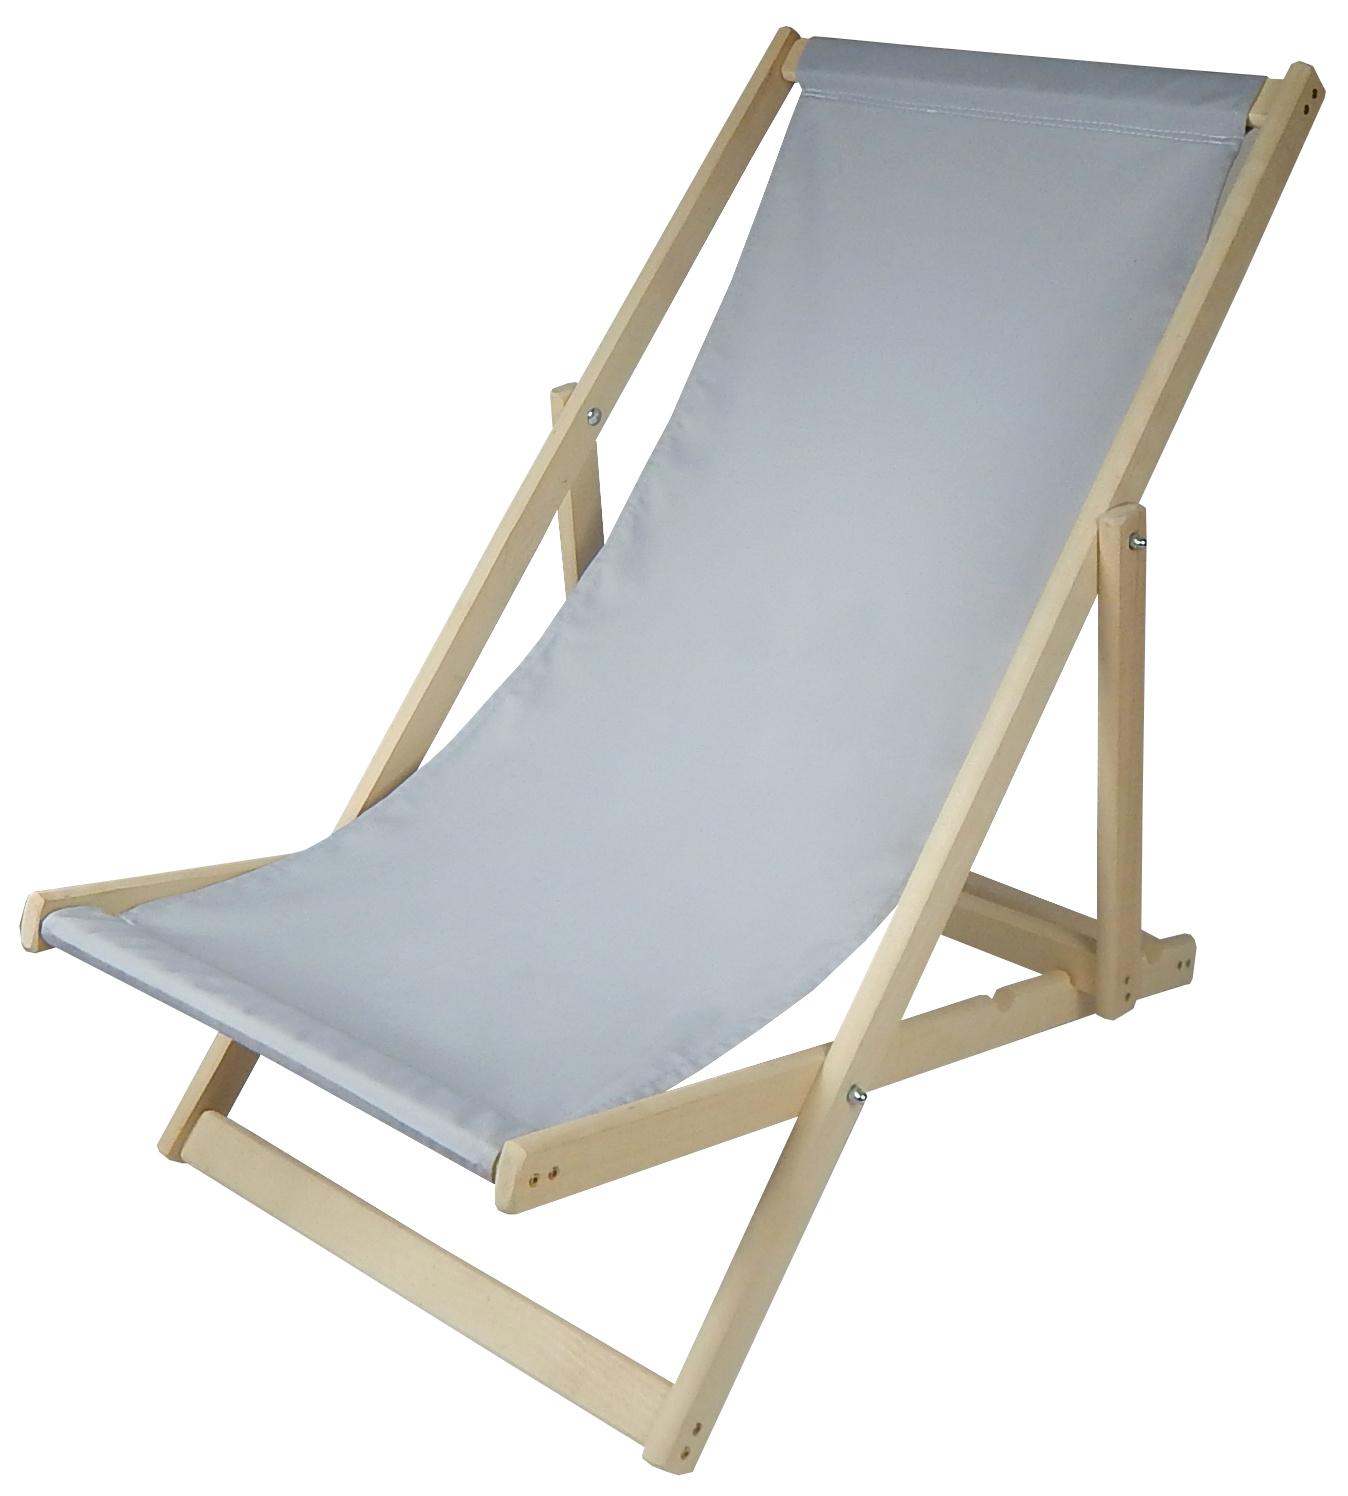 Lezak Drewniany Lezaki Plazowe Drewniane Producent Outdoor Decor Sun Lounger Outdoor Furniture